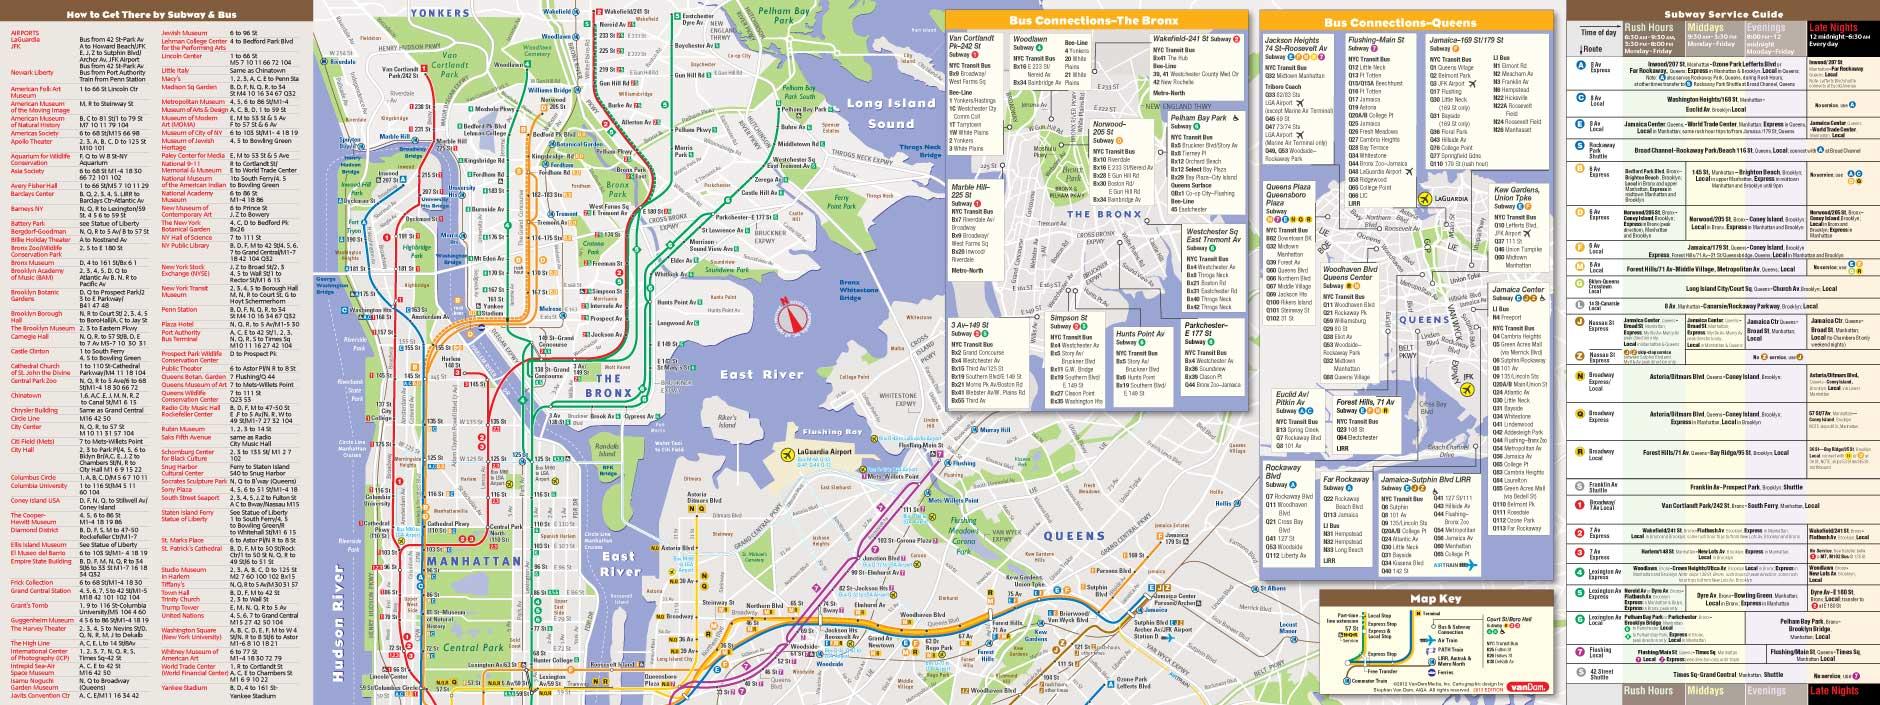 NYC Map By VanDam NYC Transit StreetSmart Map City Street Maps - Nyc unfolds map